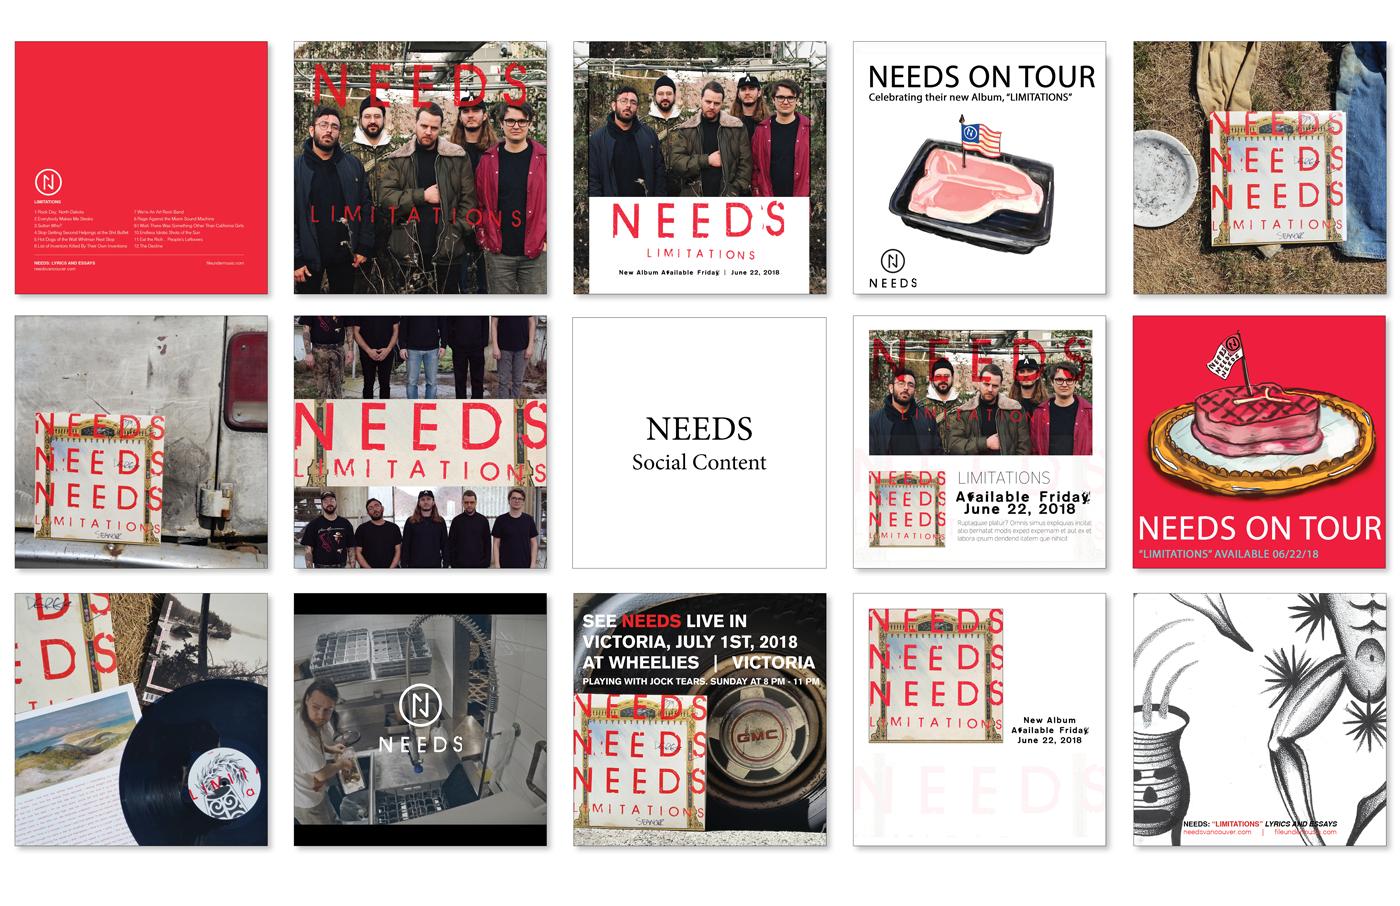 File Under: Music -  NEEDS - Album Photography - Digital Assets for Social Media